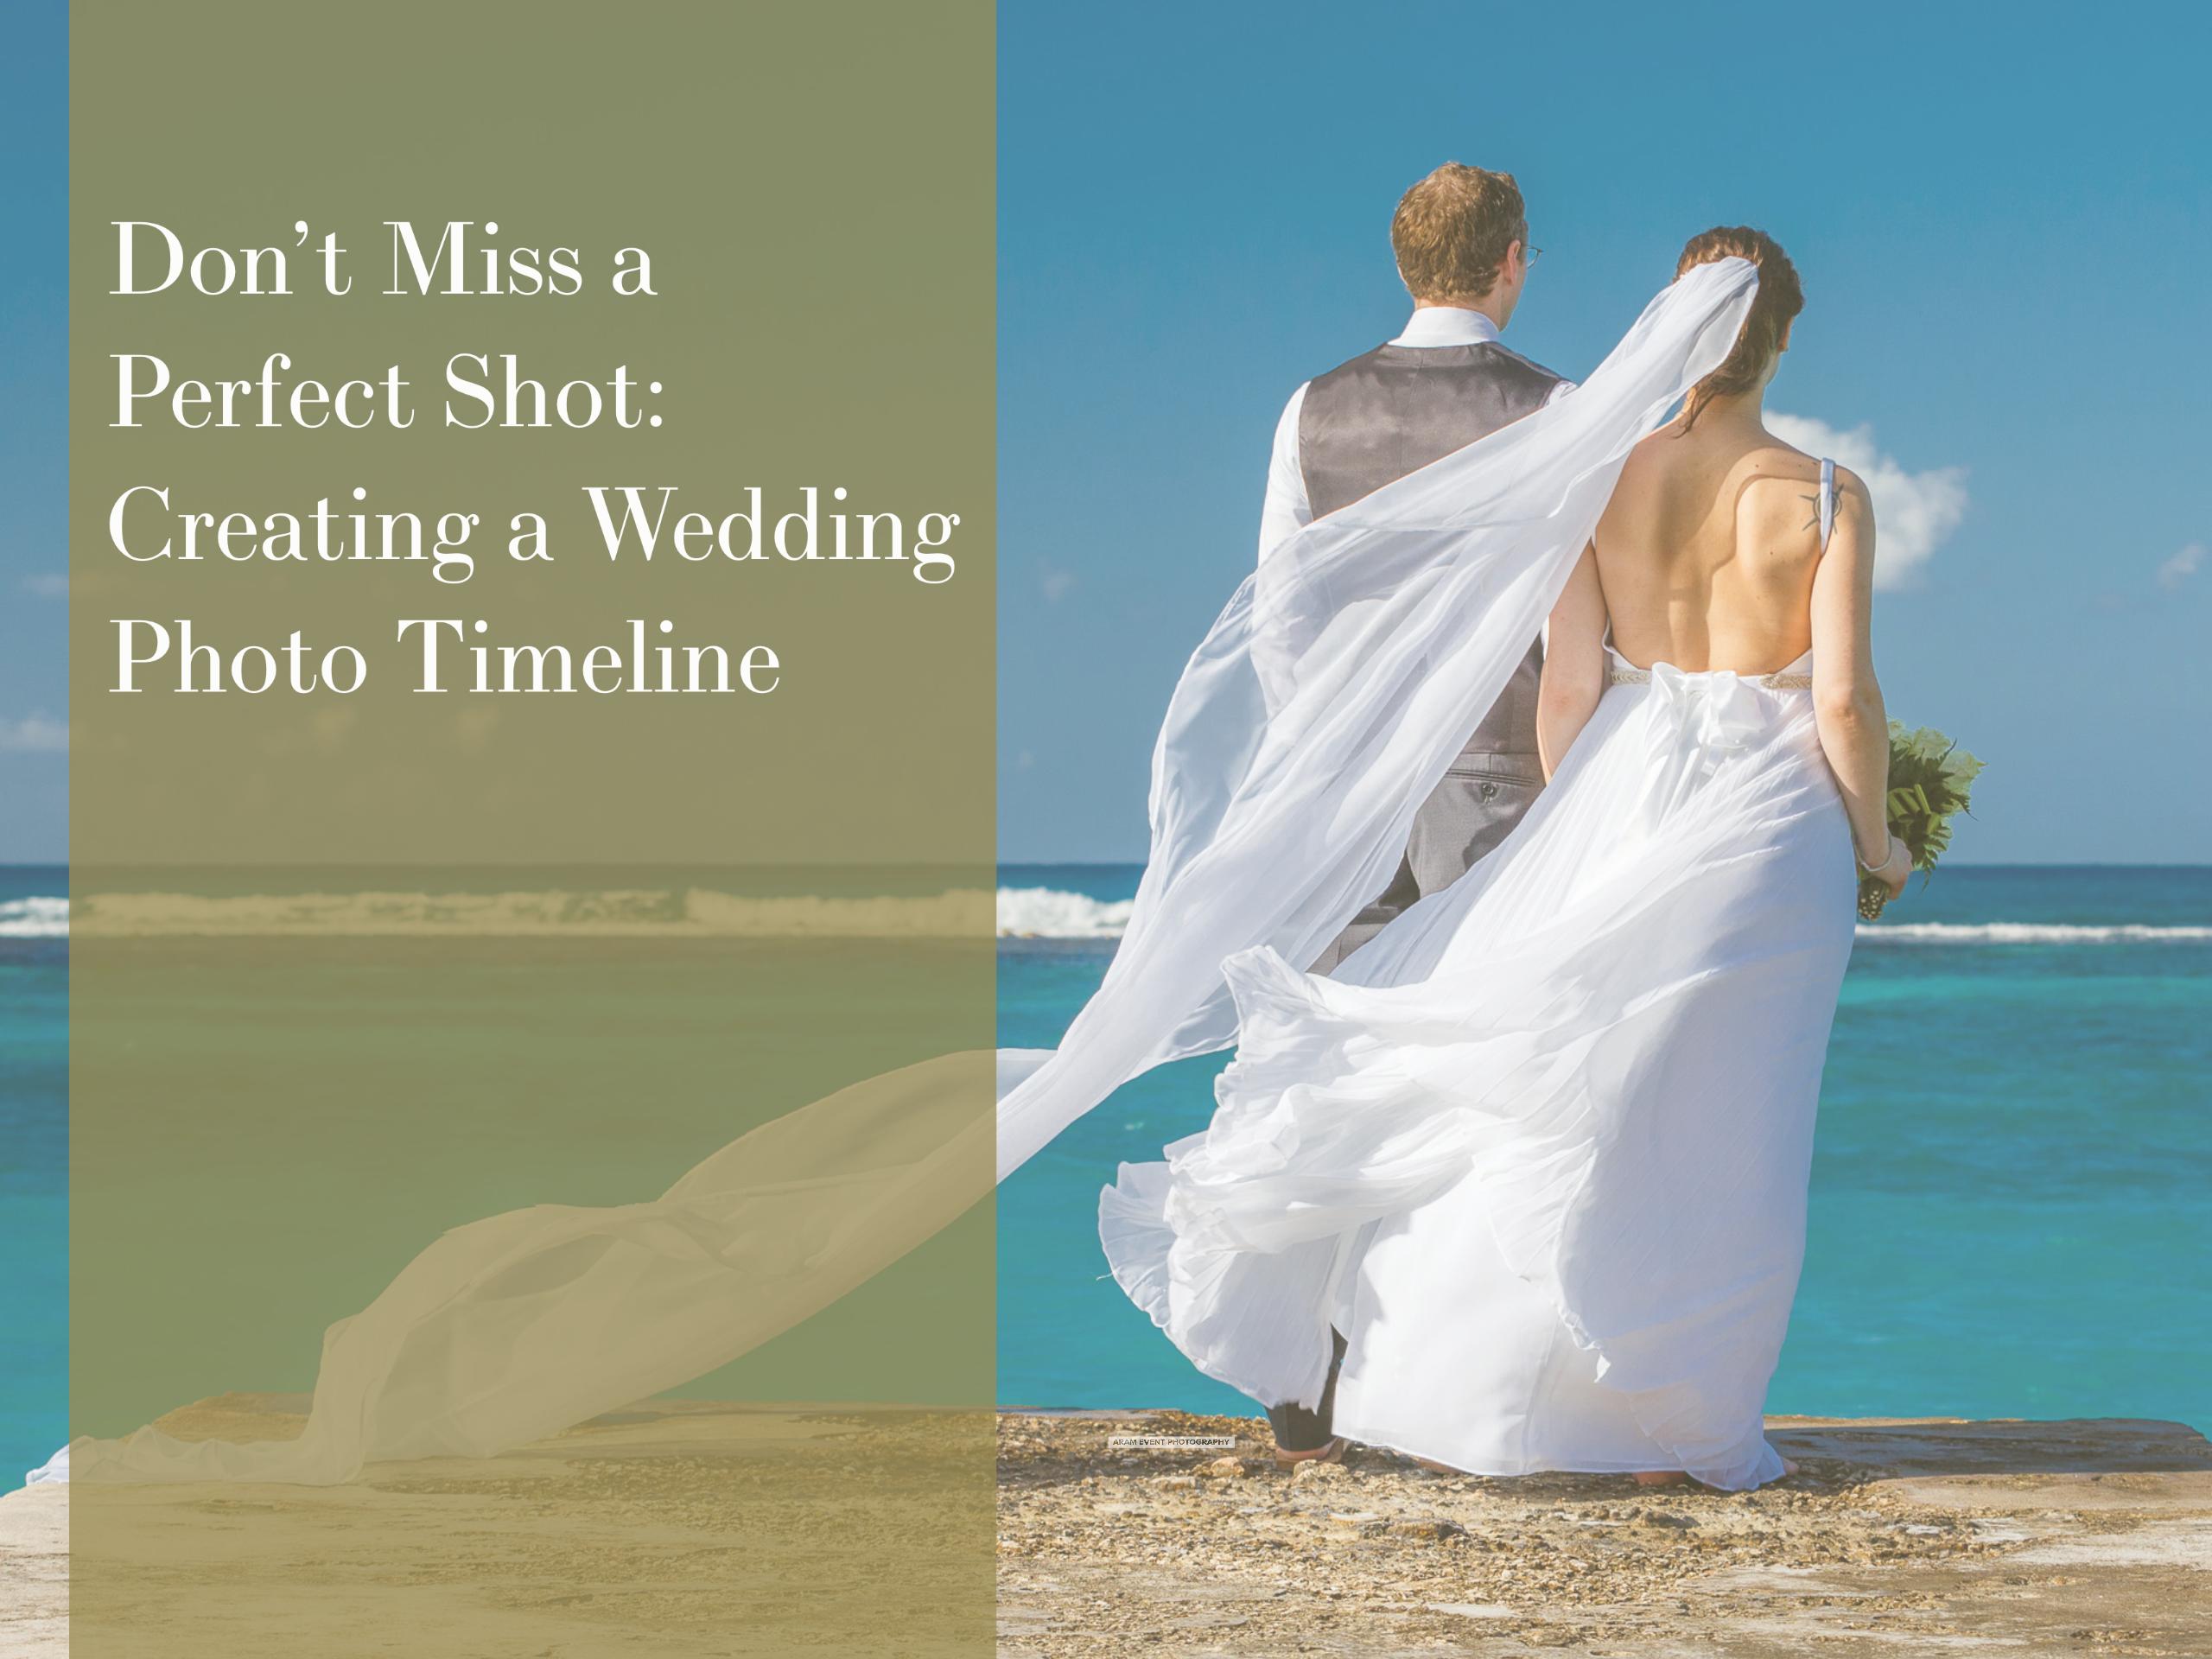 https://arameventphotography.com/wp-content/uploads/2019/12/wedding-photo-timeline.png